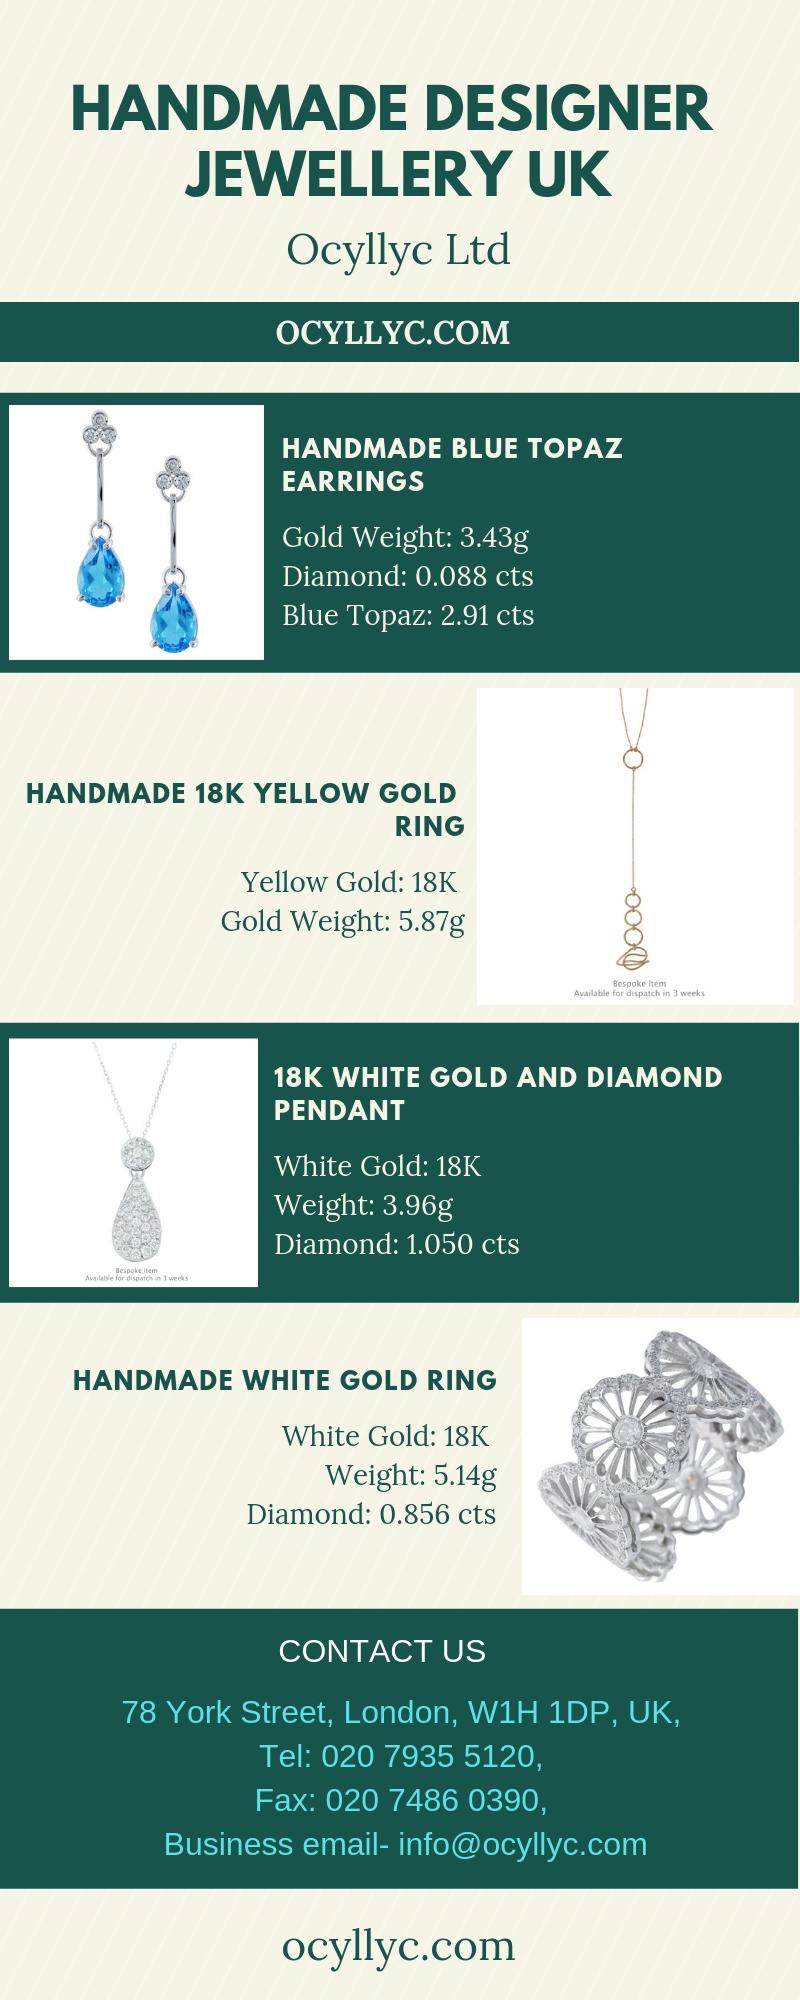 Handmade Designer Jewellery UK.jpg  by ocyllyc